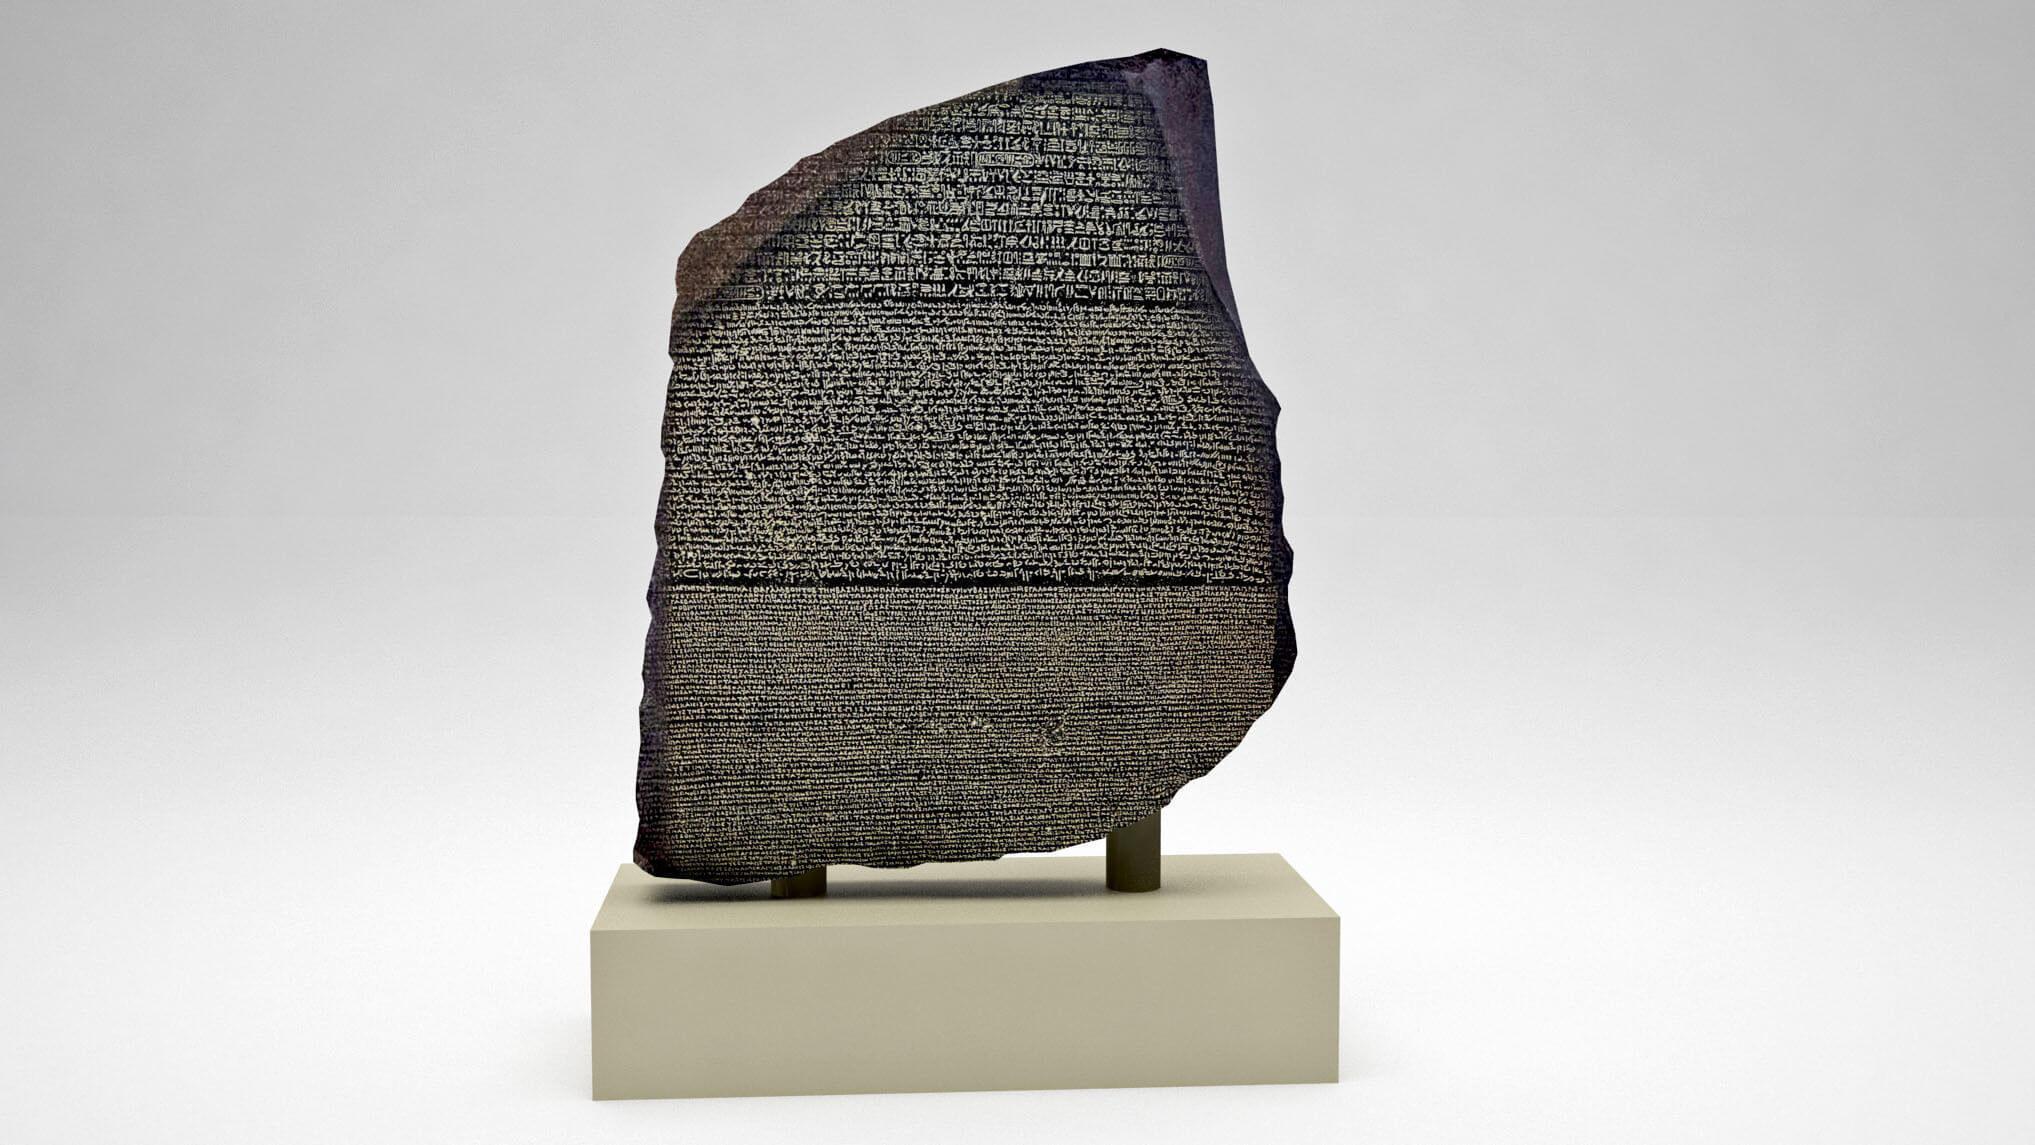 The rosette stone that helped translate Egyptian hieroglyphs